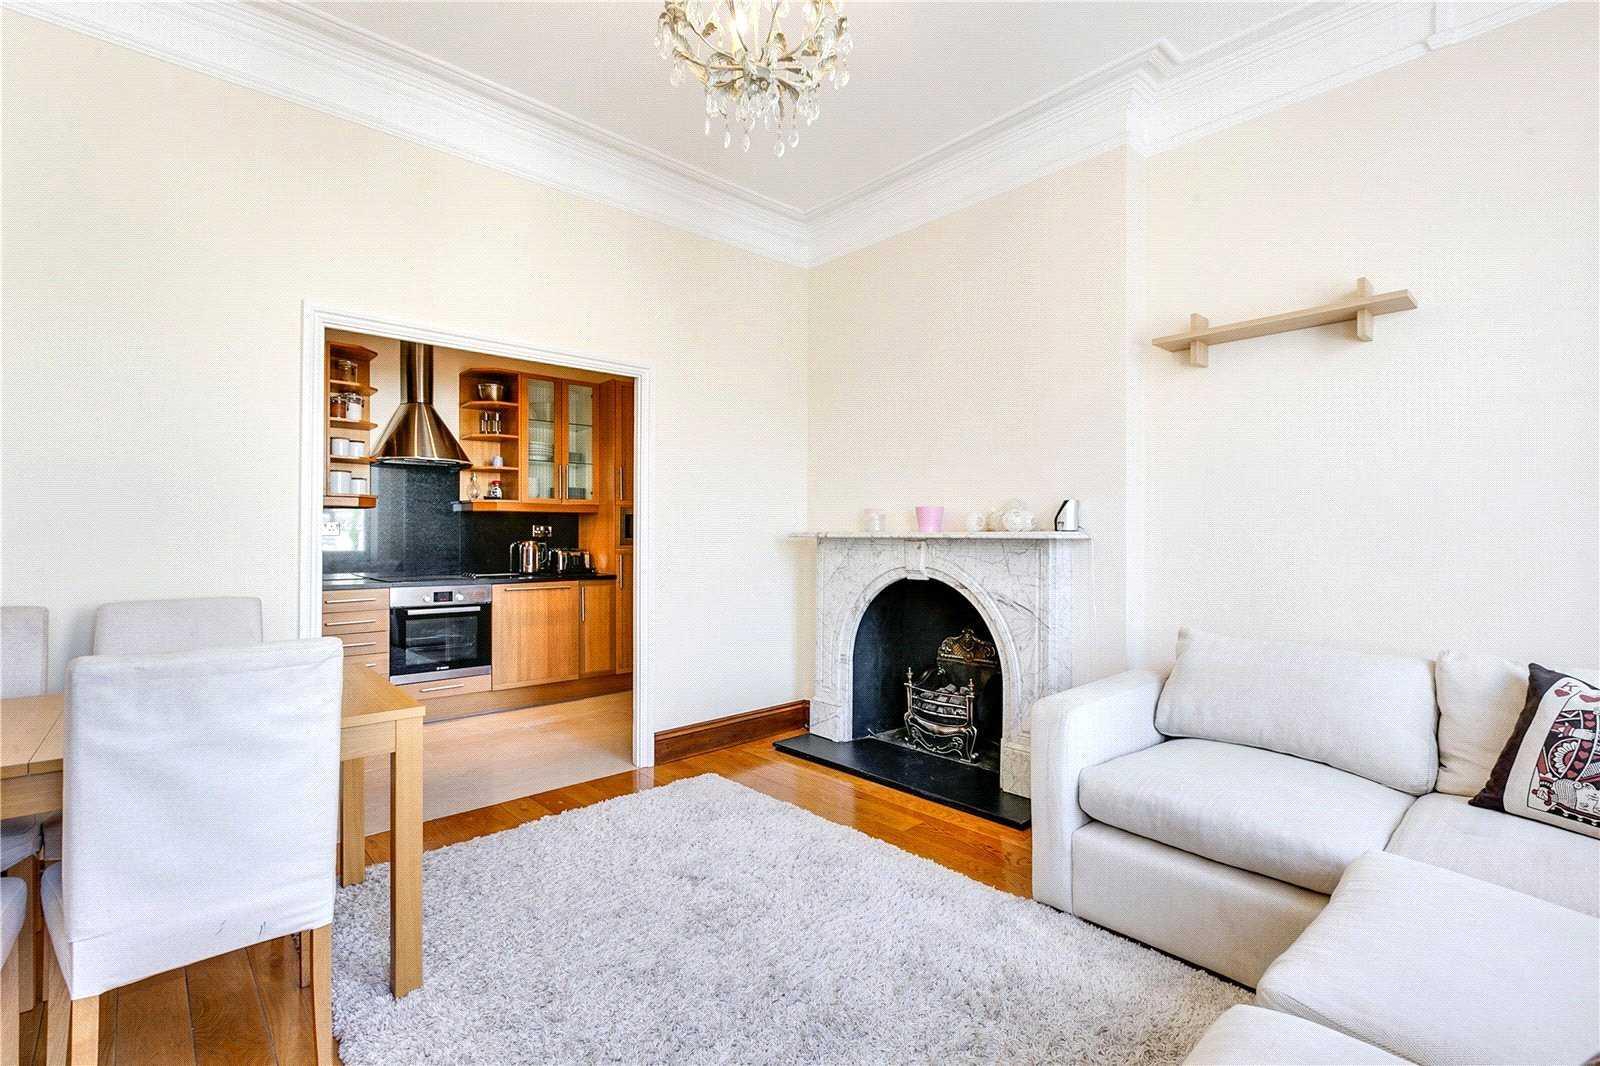 Apartment London  -  ref RPT200001 (picture 3)